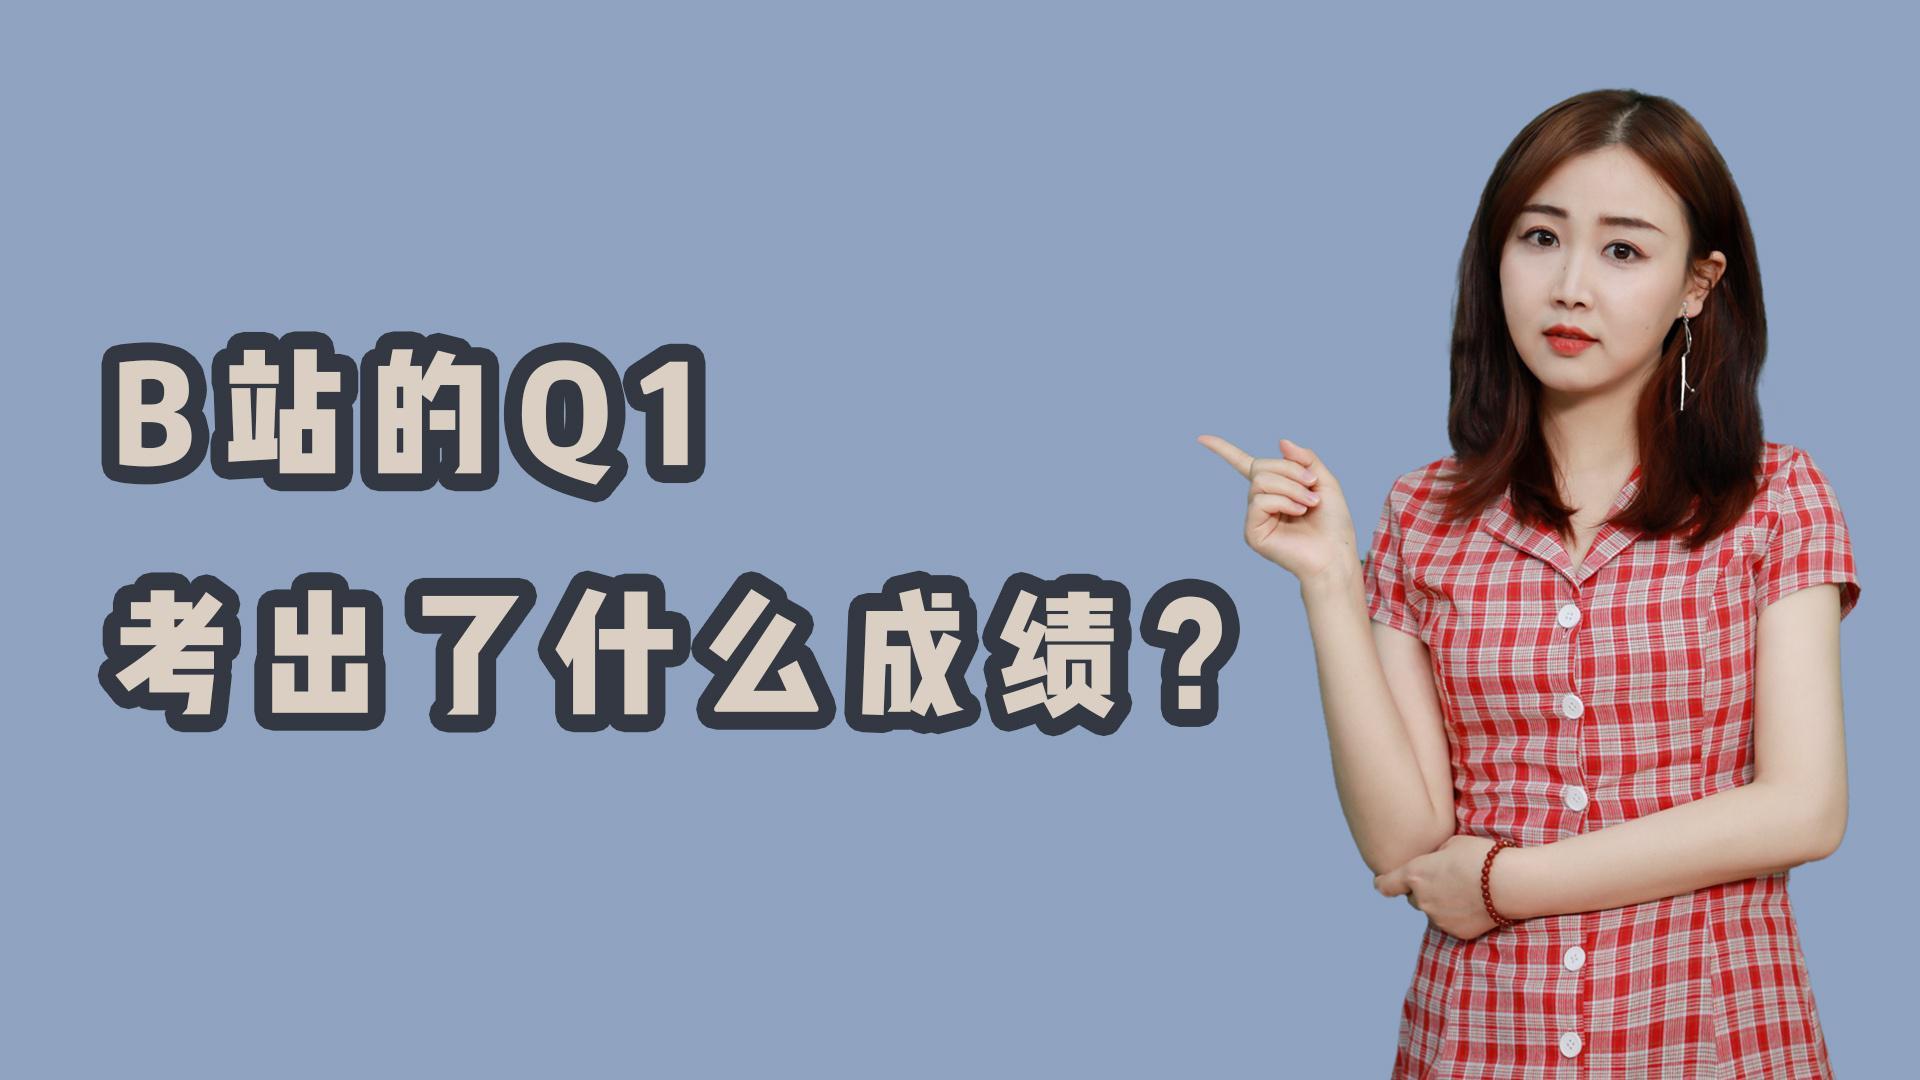 B站的Q1考出了什么成绩?